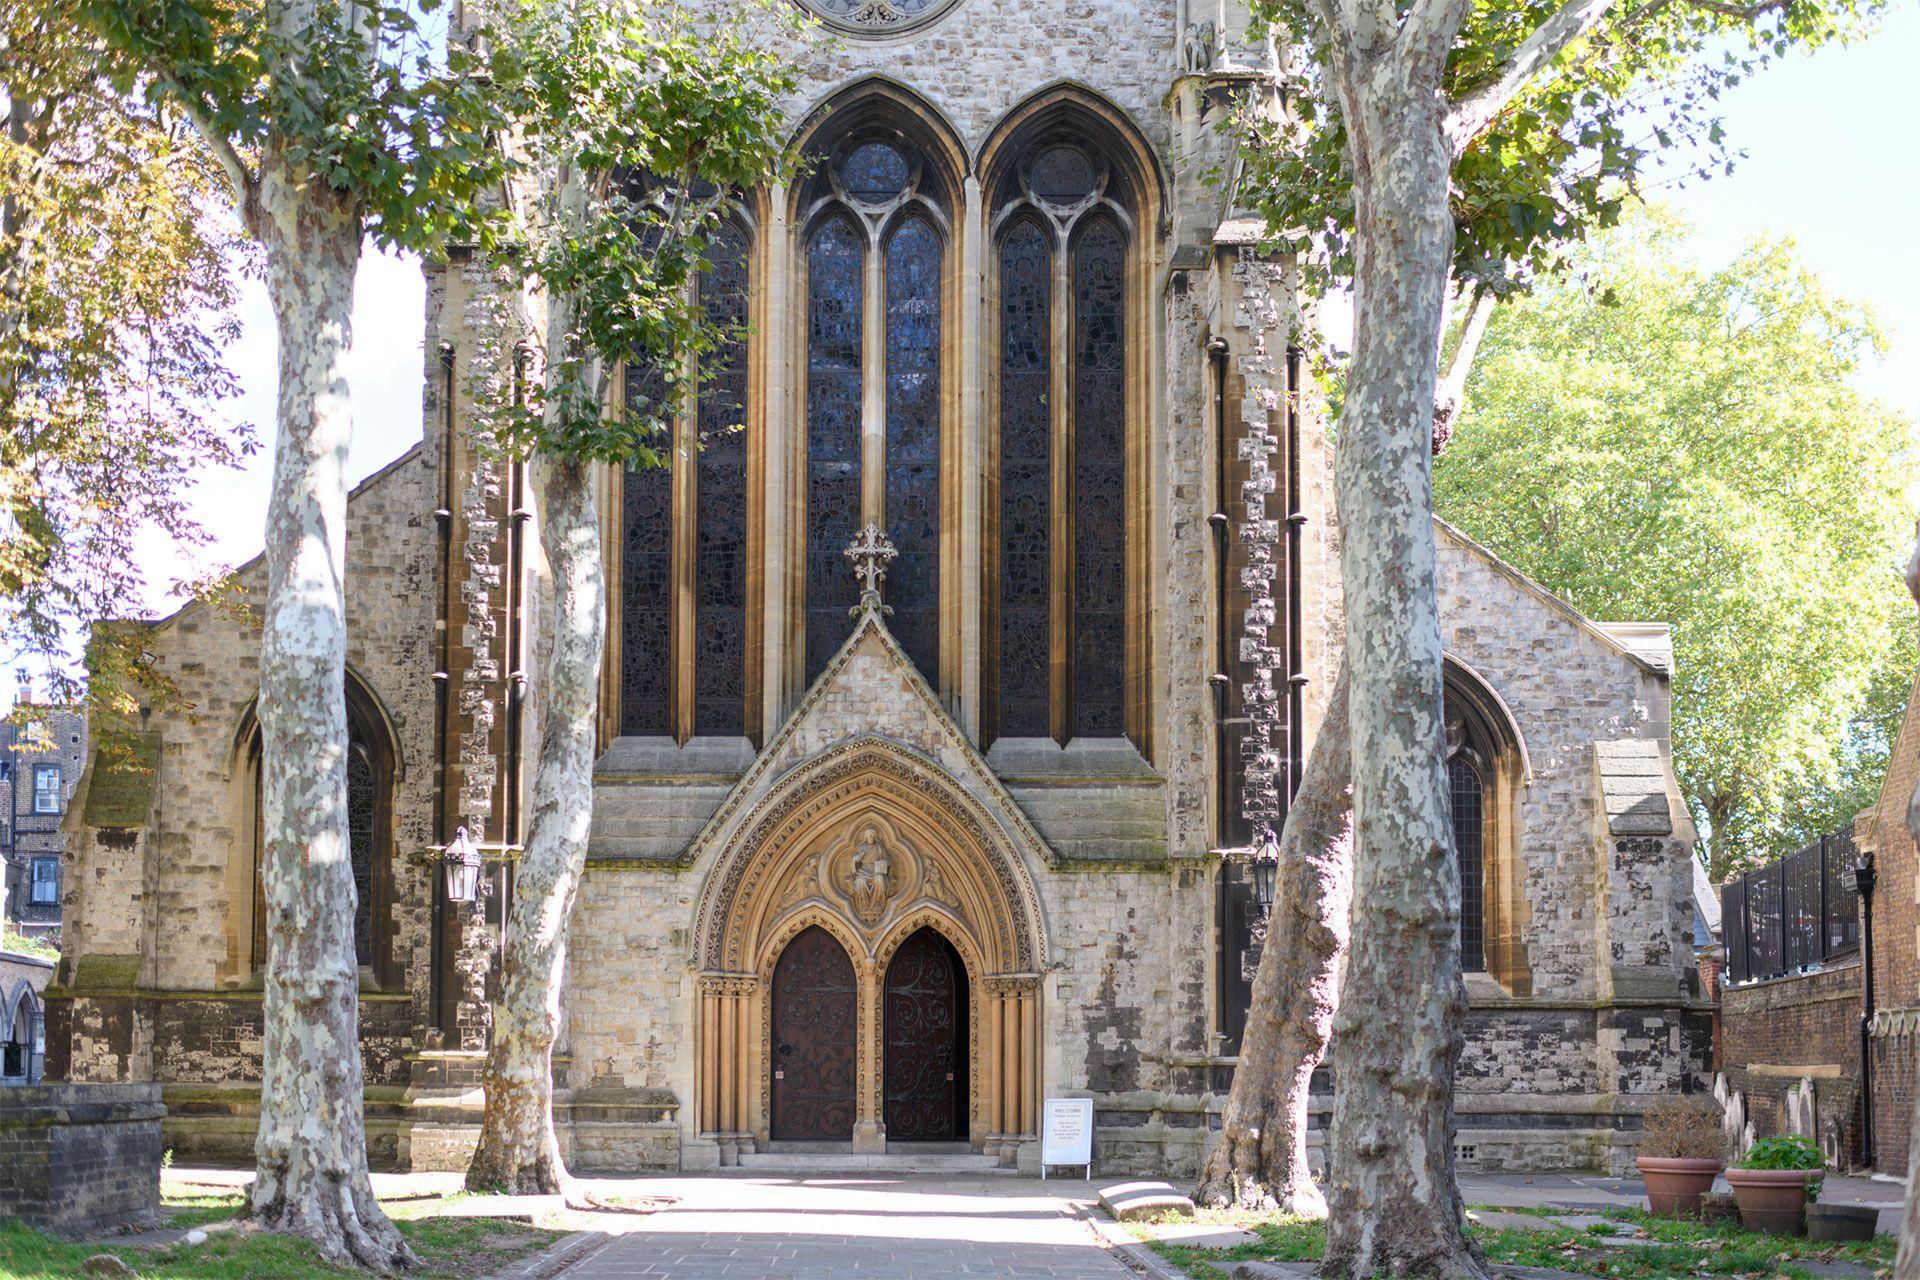 Stunning old church just around the corner from the Gordon rental